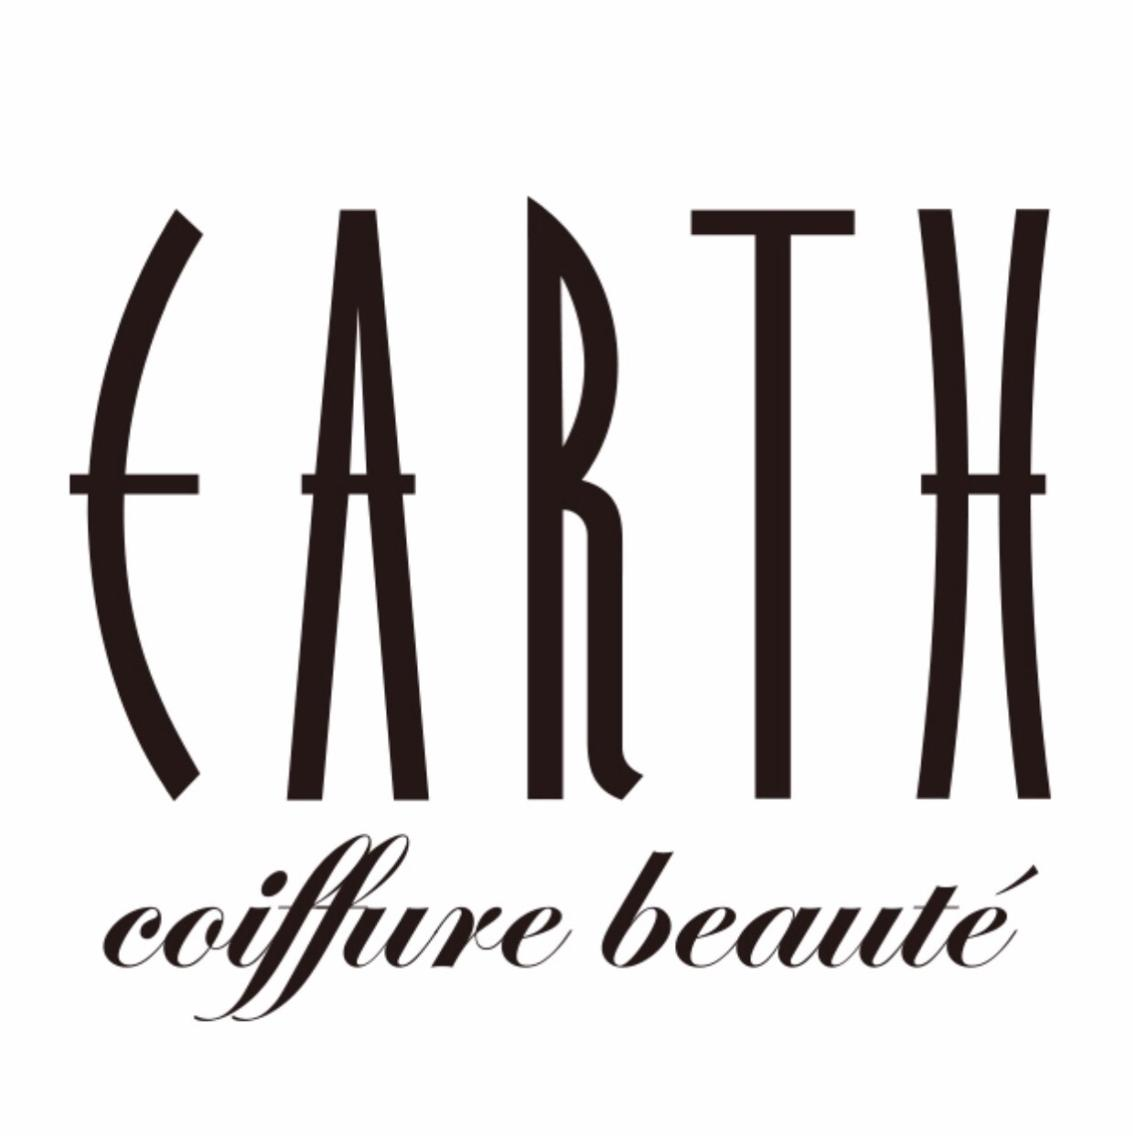 EARTHcoiffure beaute野々市店所属・江連大の掲載